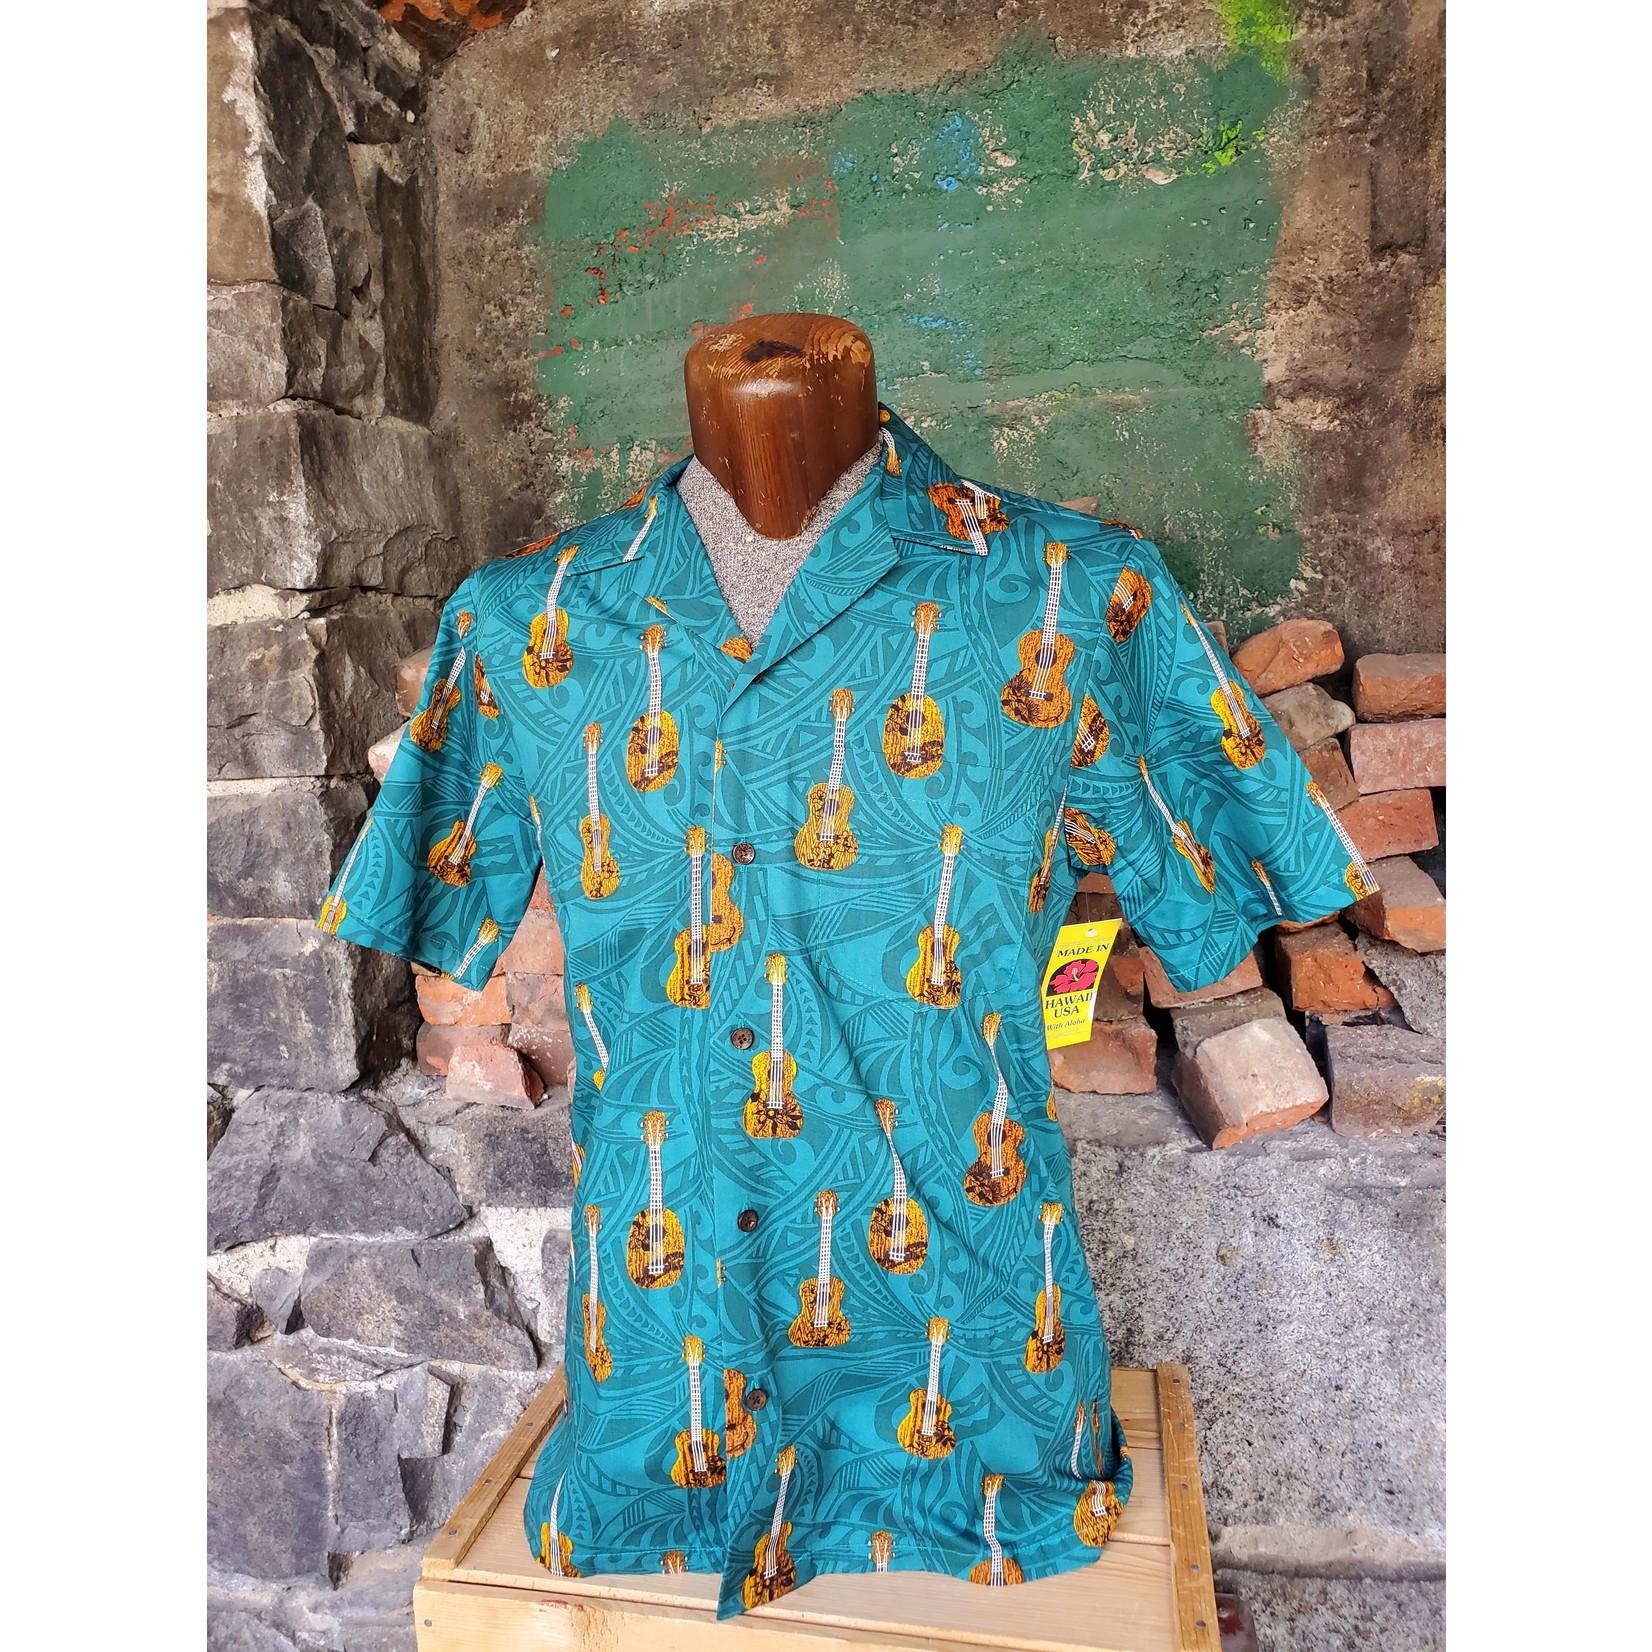 RJC Authentic Hawaiian Shirt - Teal Guitars